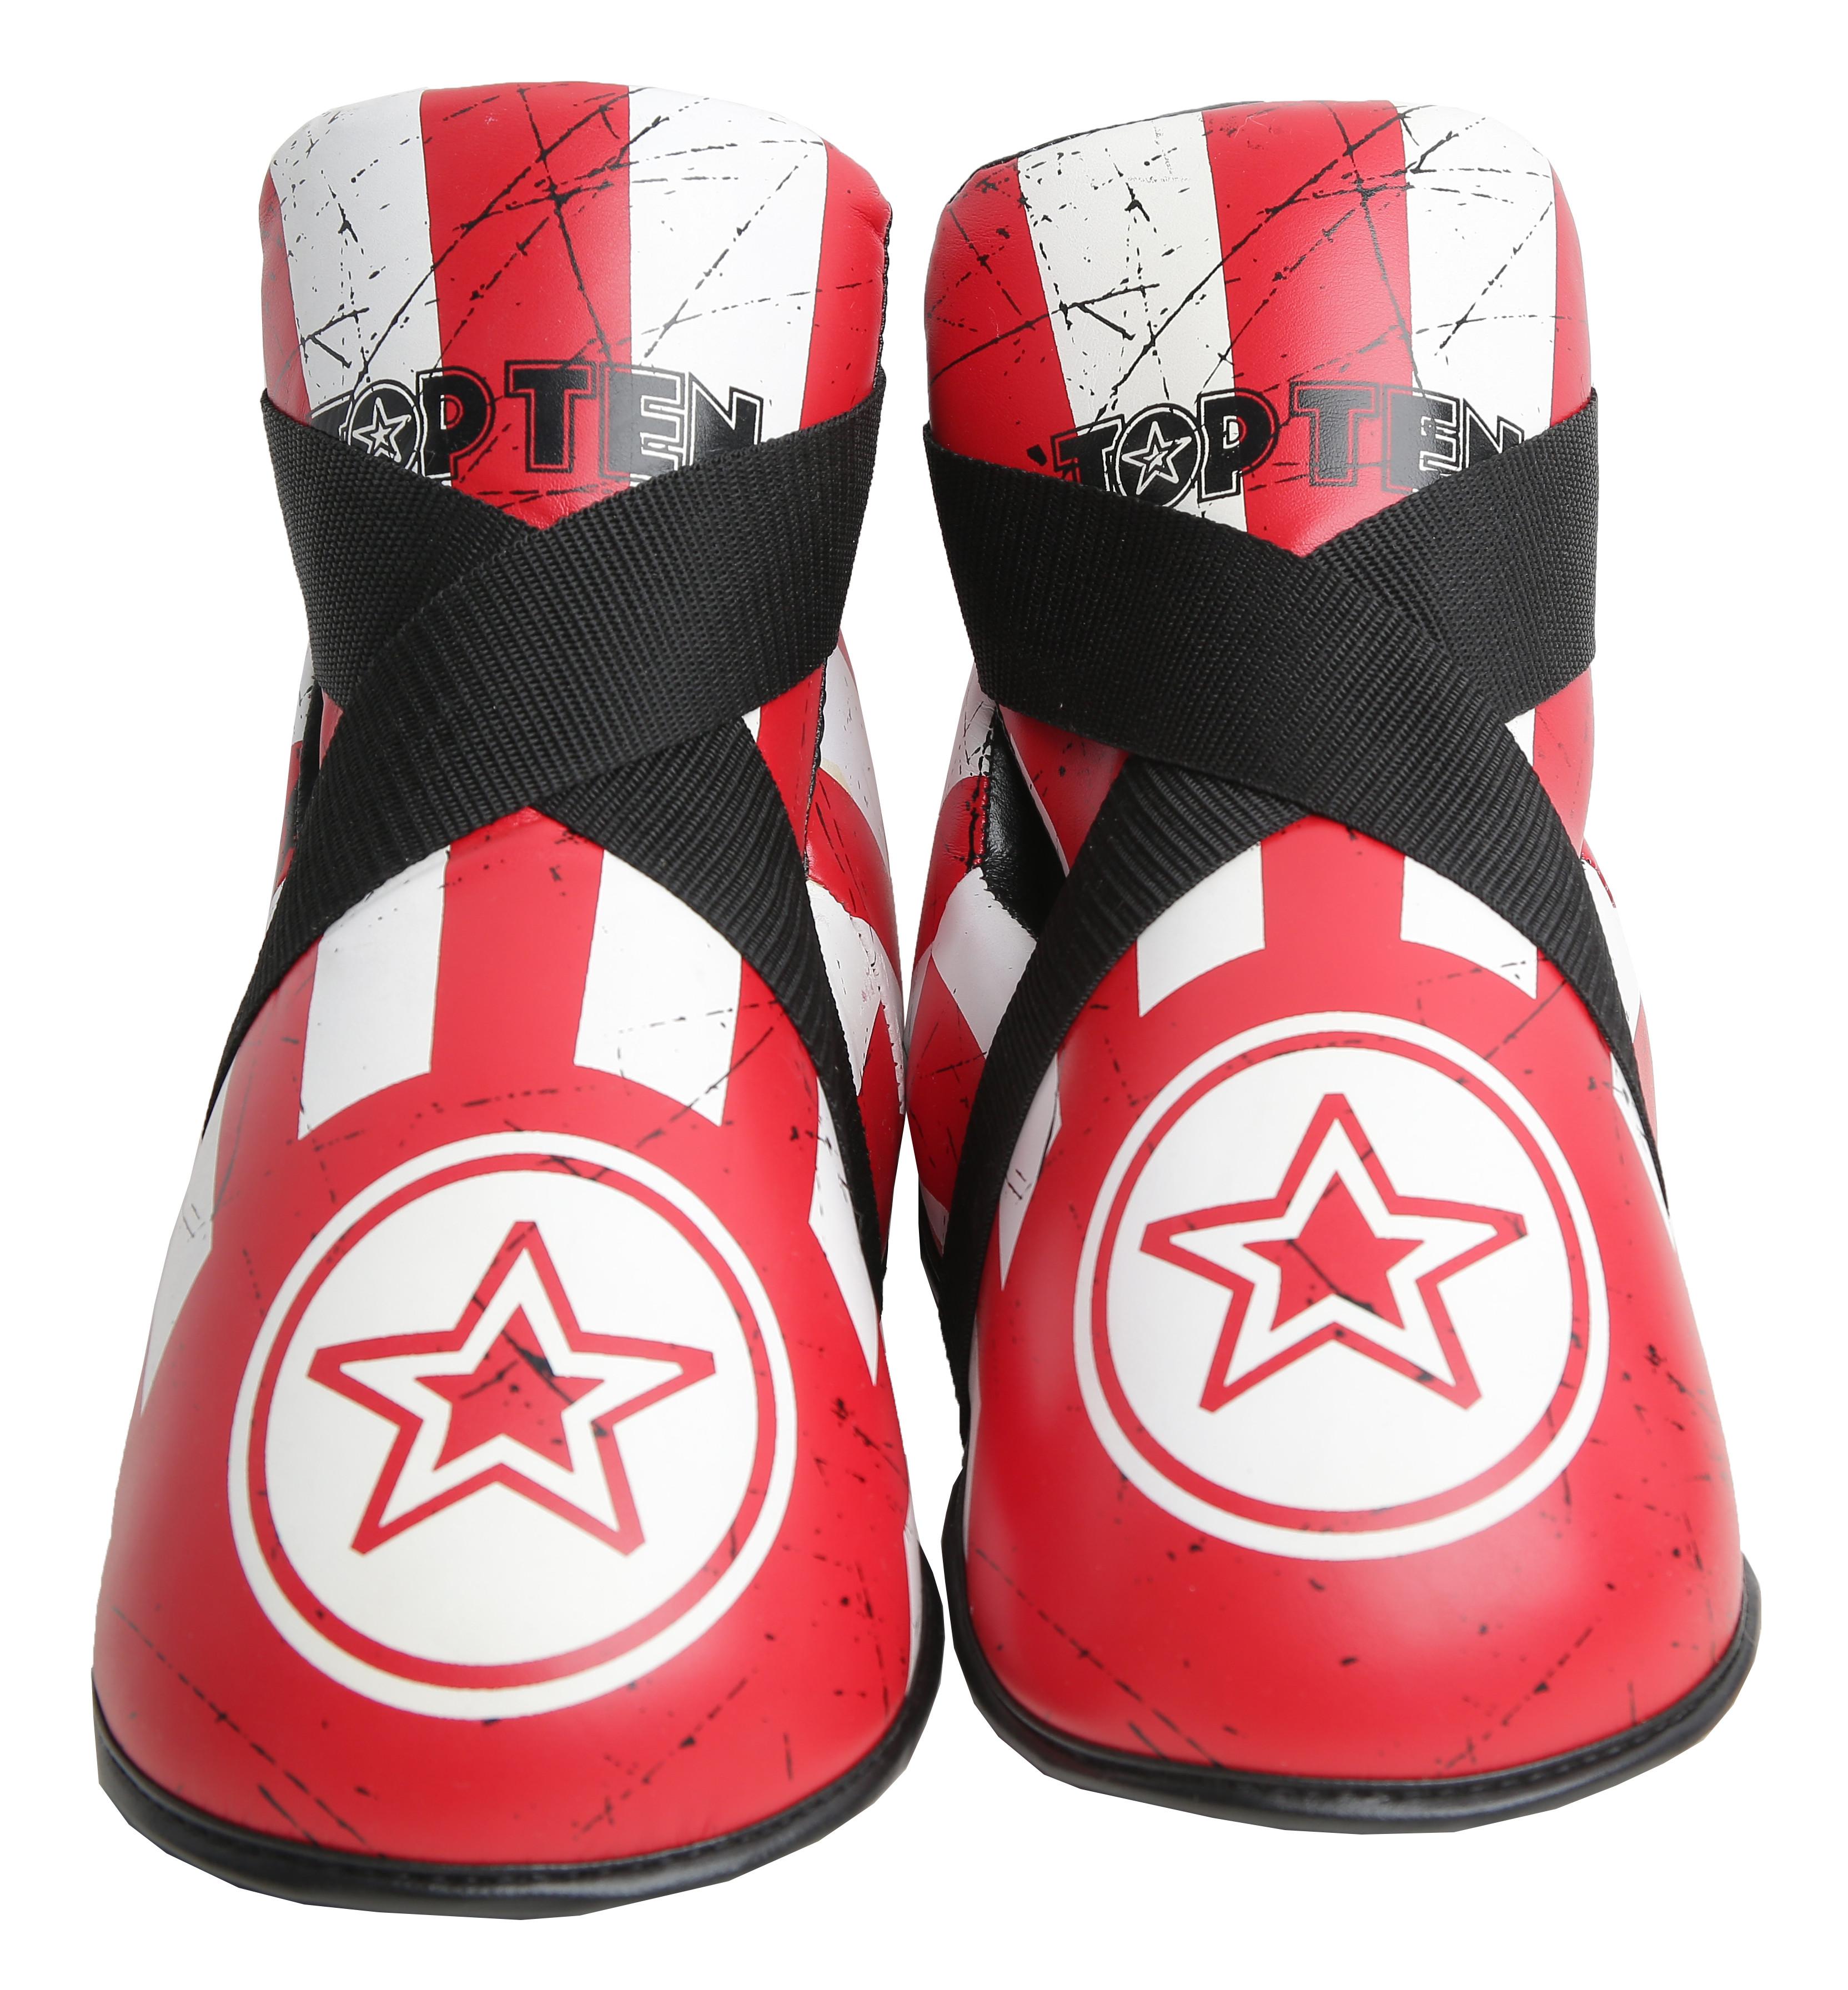 Футы top ten star red white